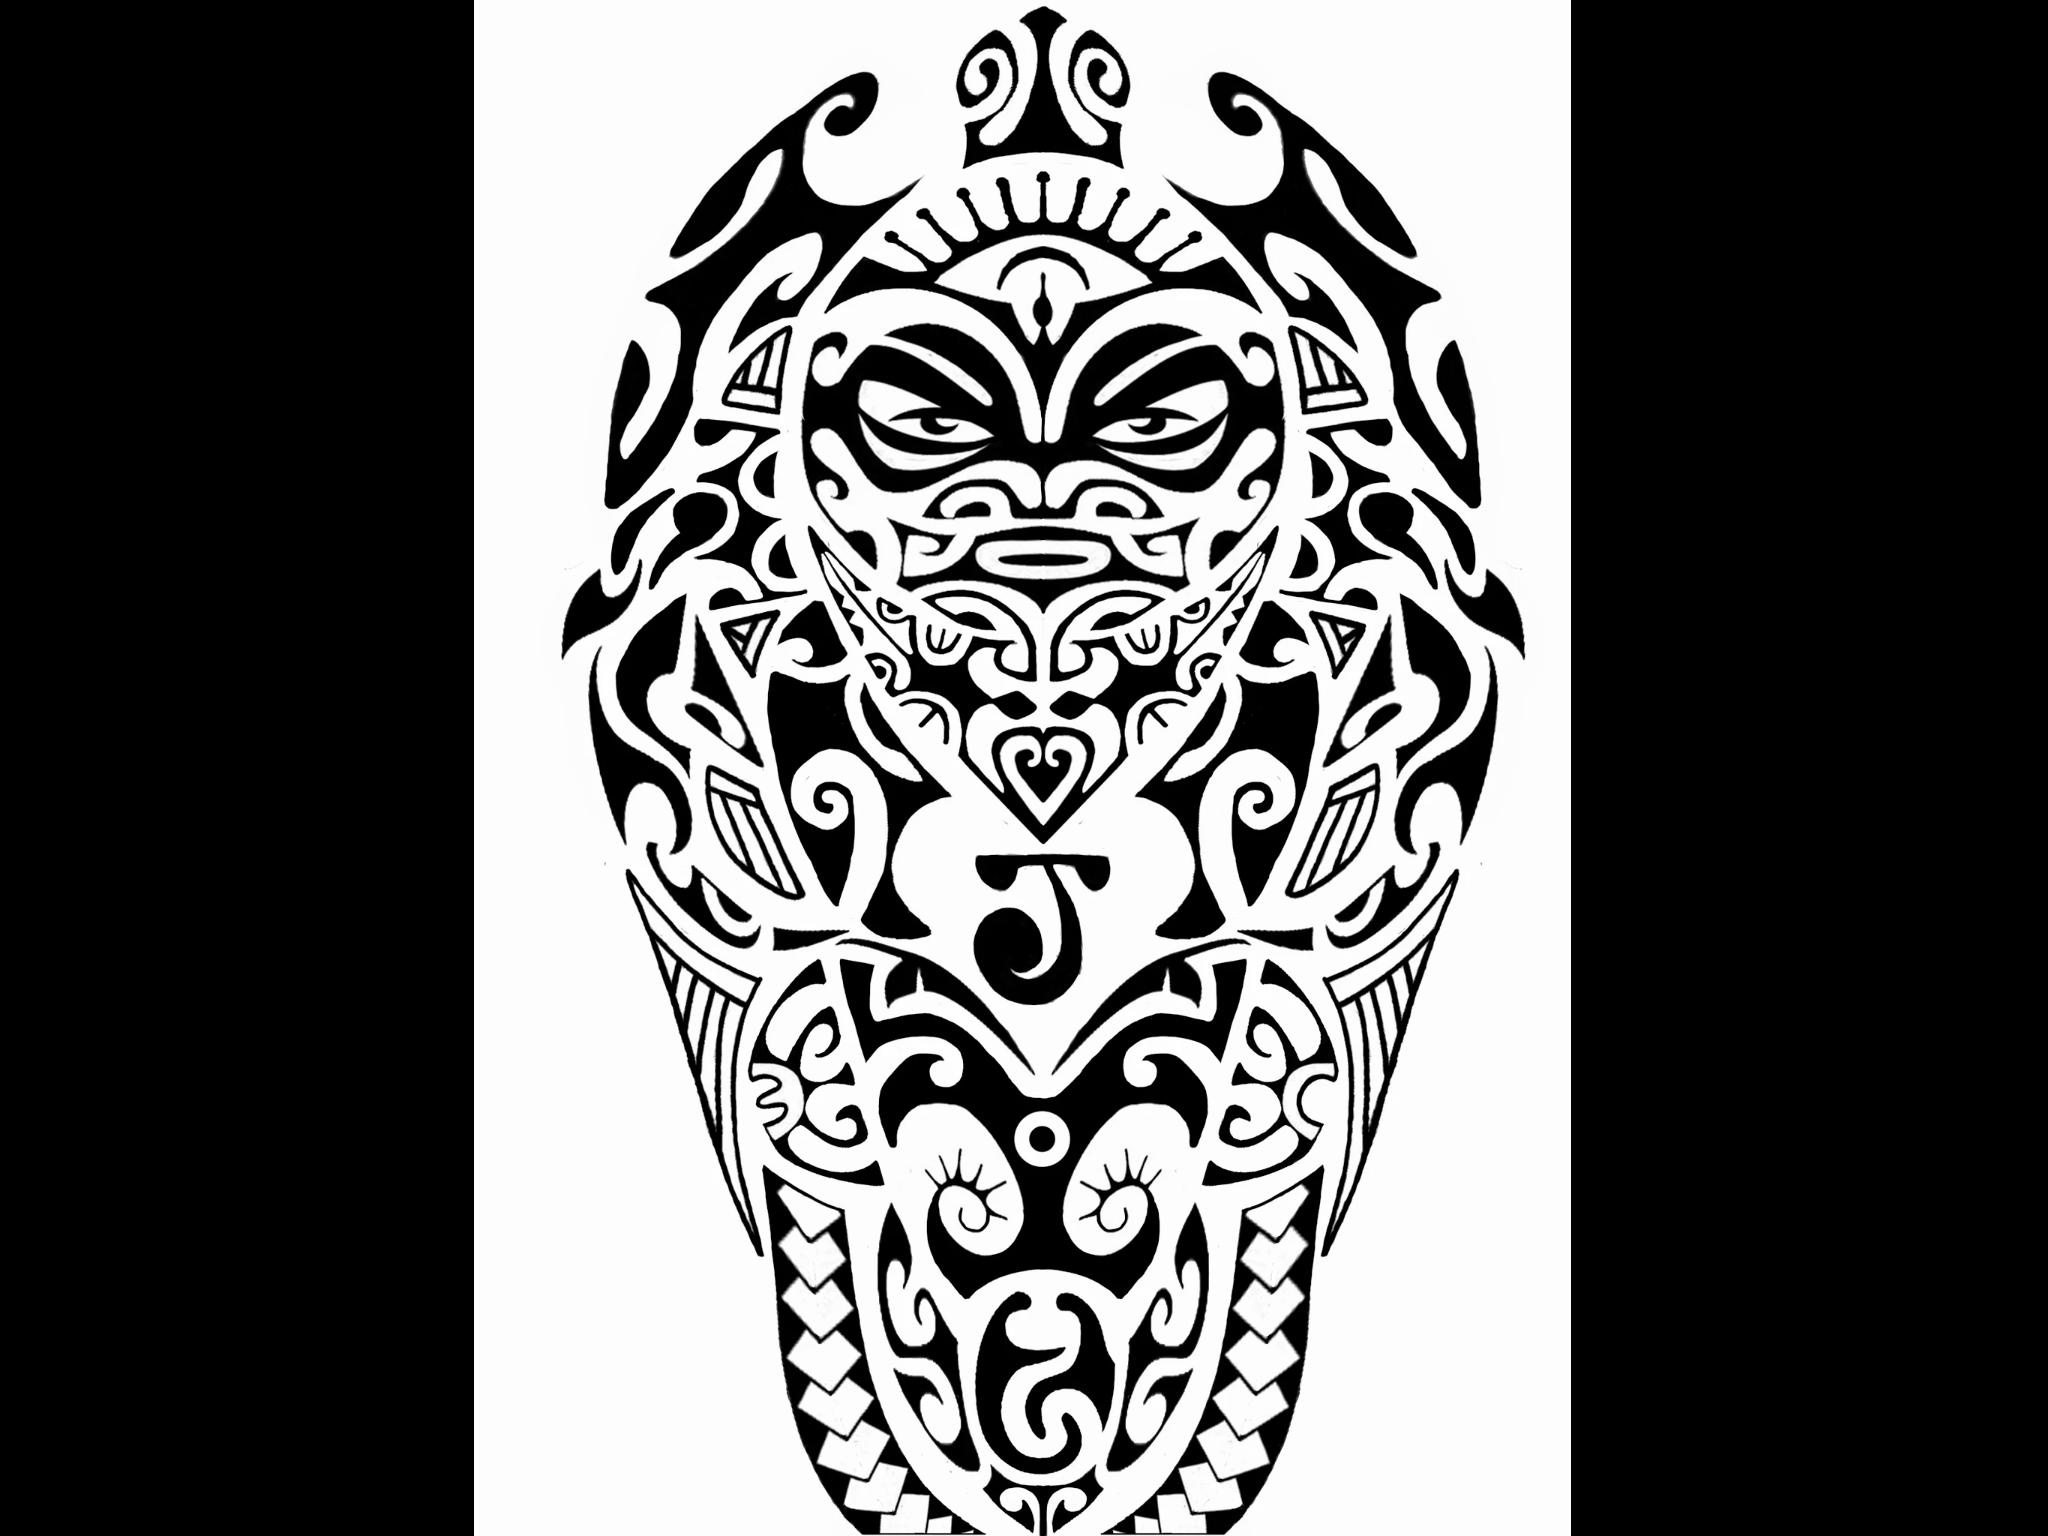 2048x1536 Pin By Keoni Gredvig On Tattoo Inspiration Maori